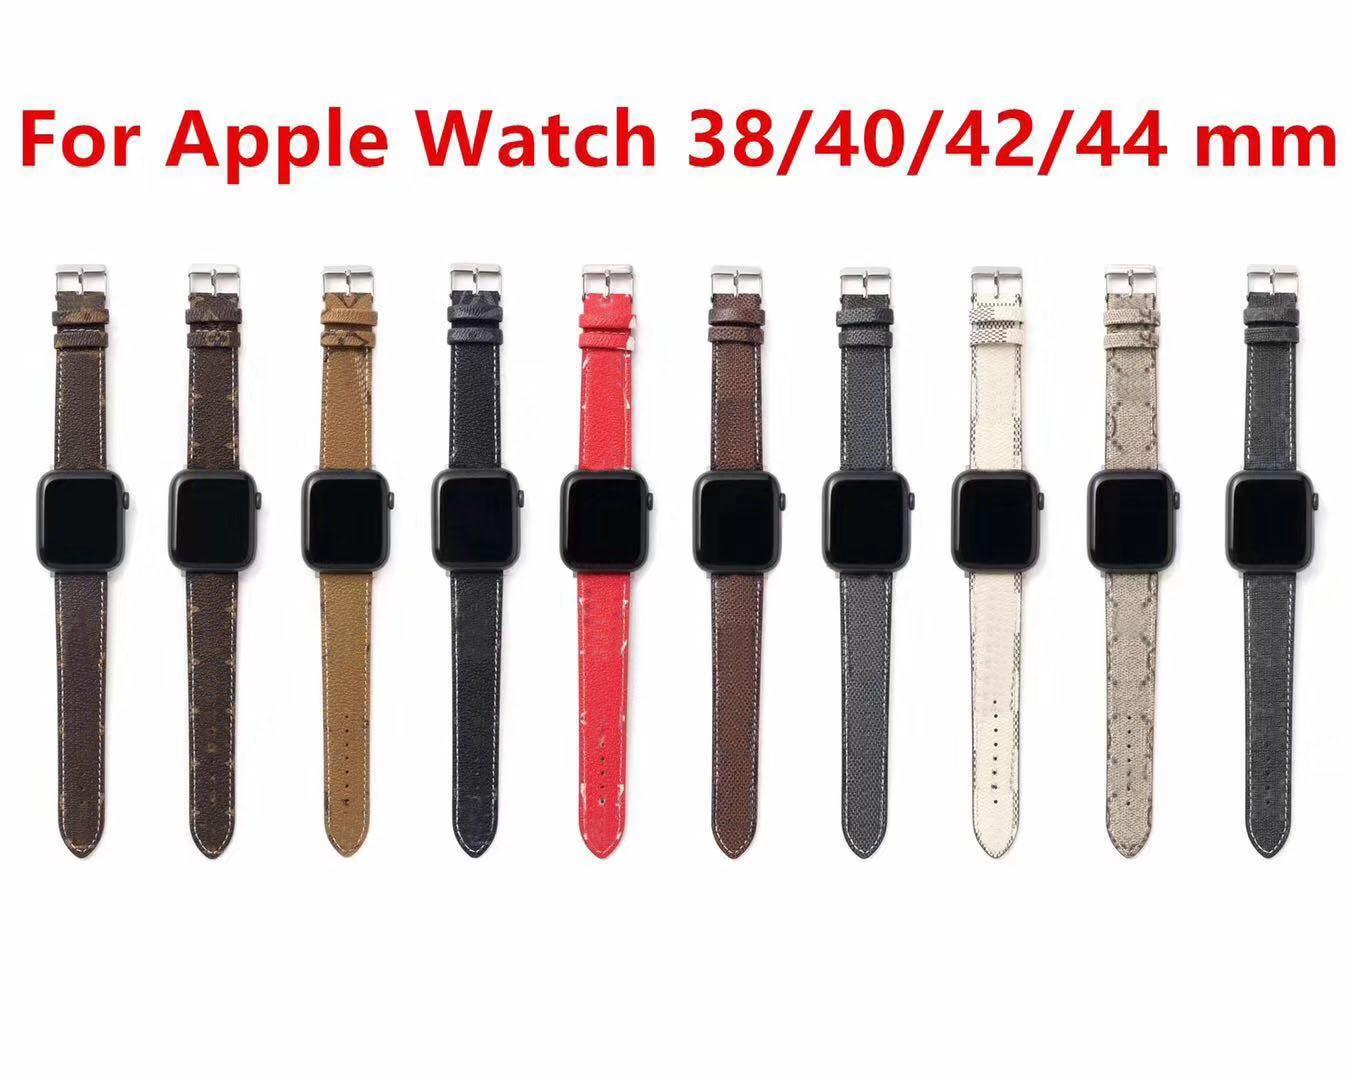 VV مصمم watchbands watchband 42 ملليمتر 38 ملليمتر 40 ملليمتر 44 ملليمتر iwatch 1 2 3 4 5 العصابات جلدية حزام سوار الأزياء المشارب شحن مجاني